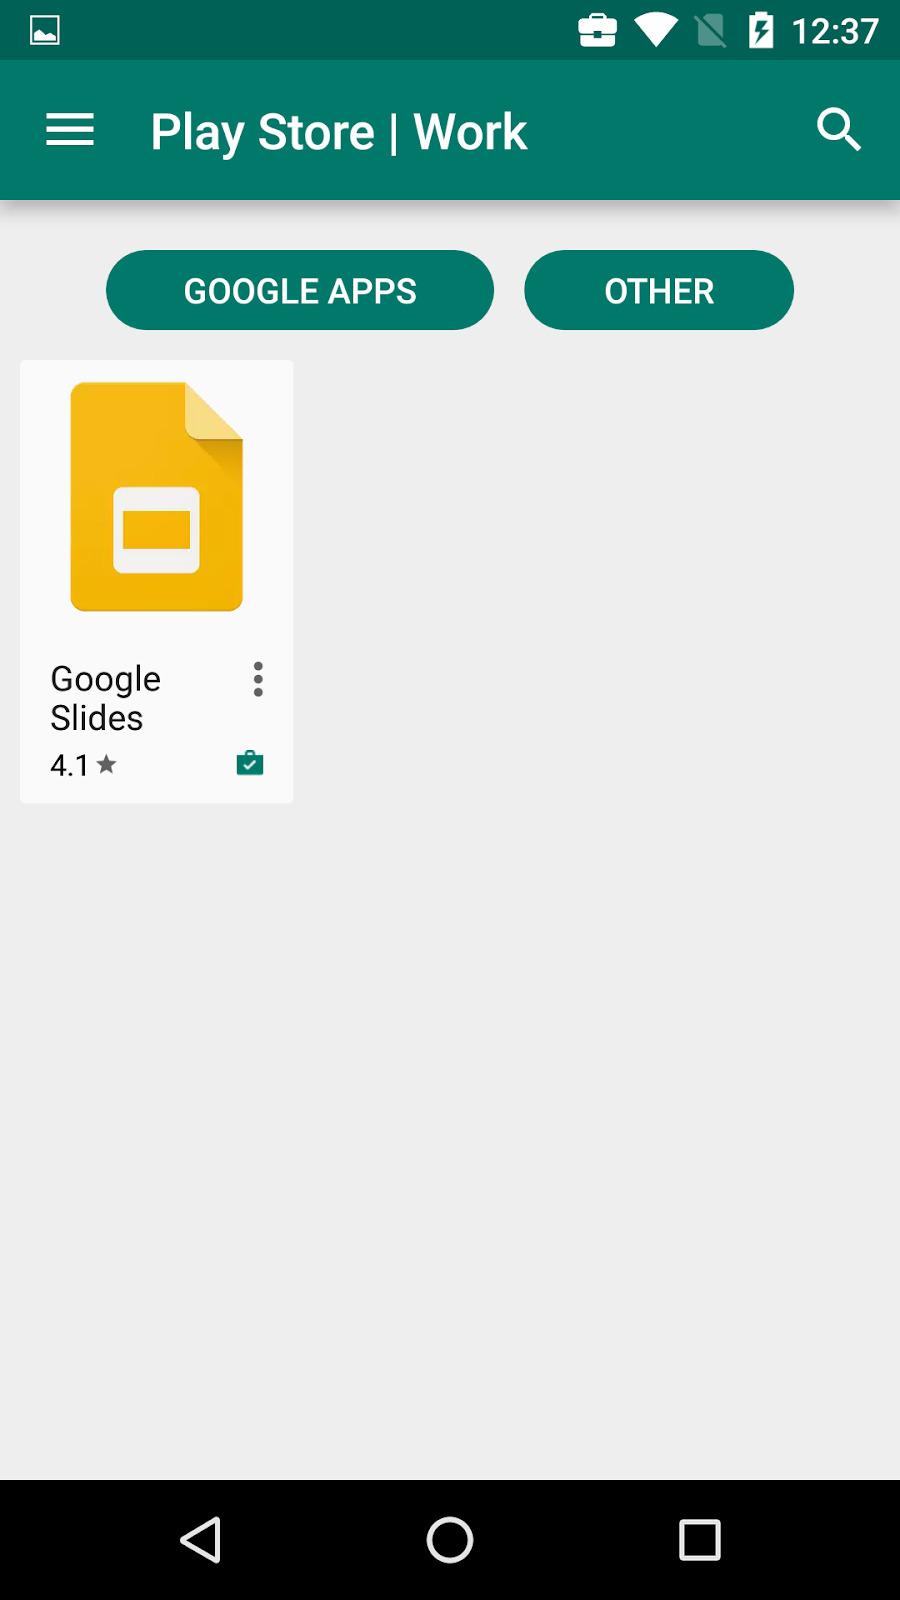 C:\Users\rafal.nawrocki\Desktop\KEYS\Screenshot_20160704-123718.png